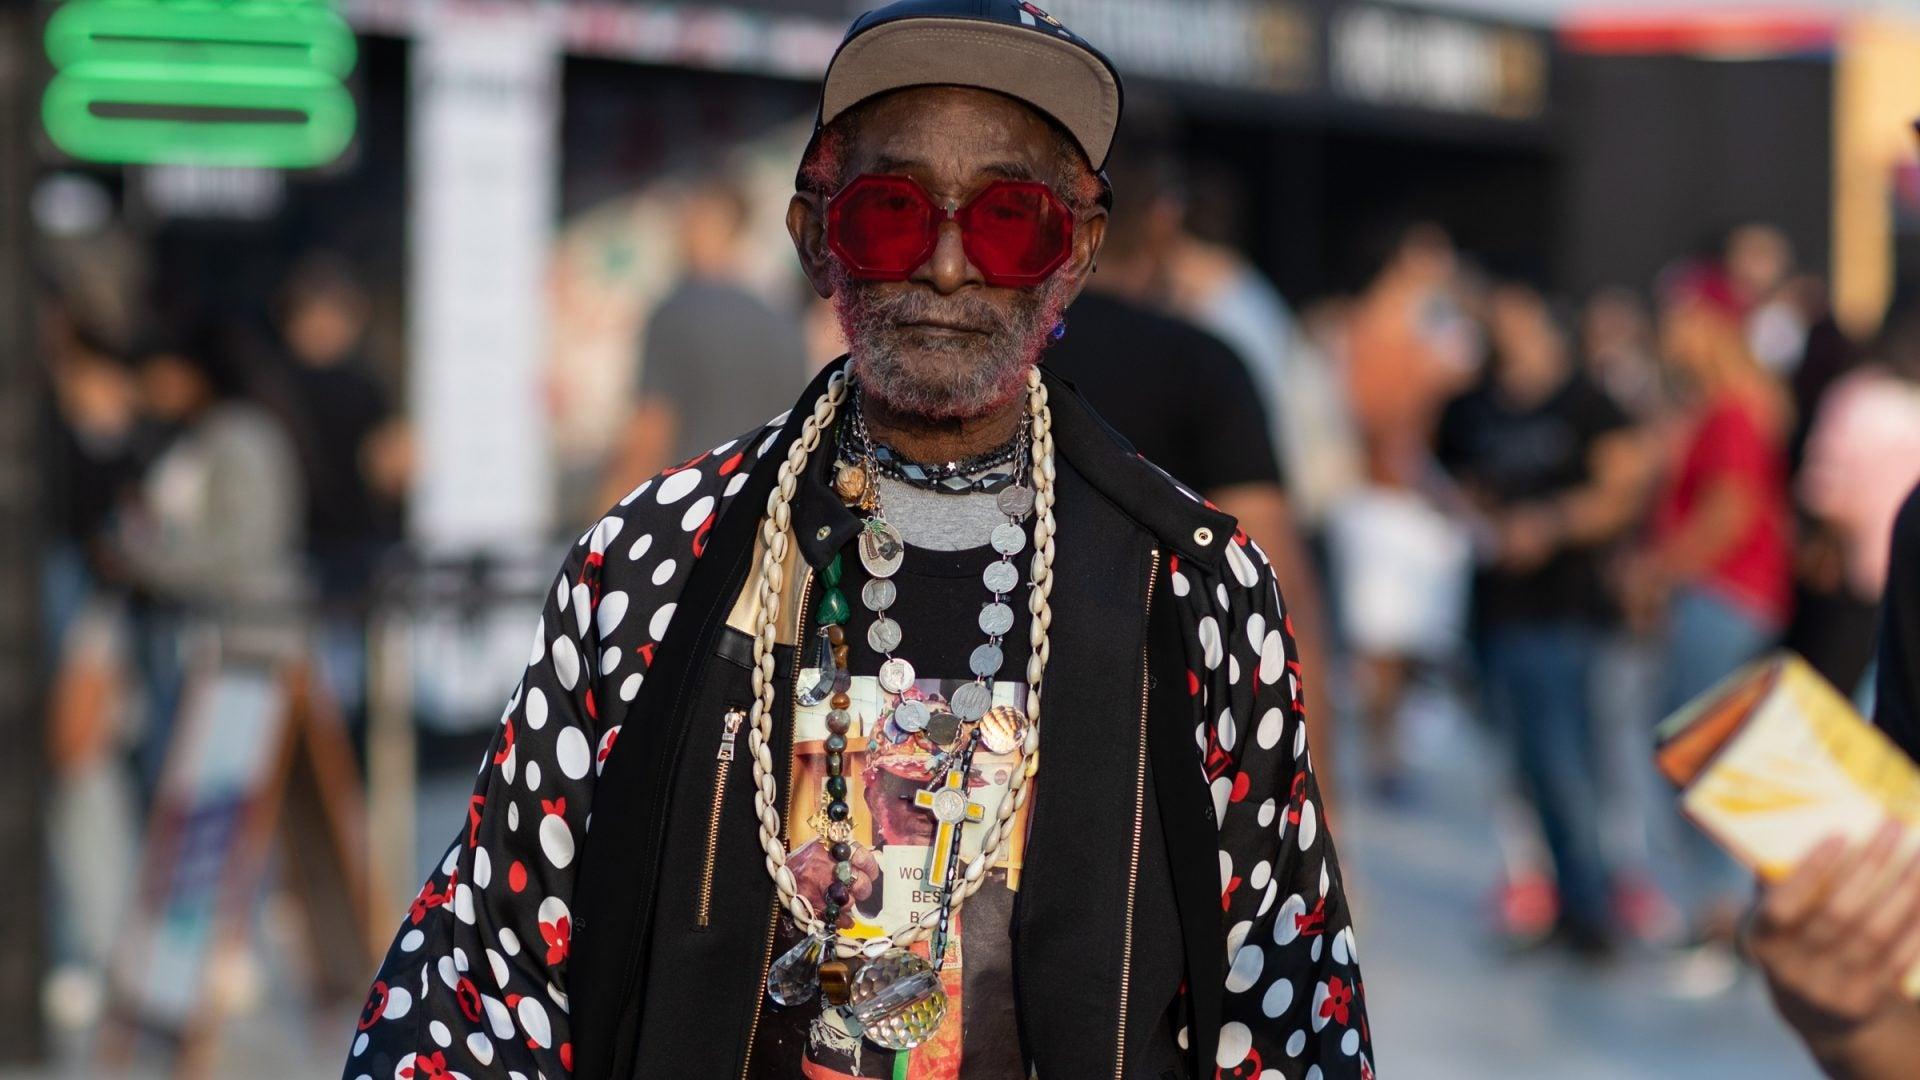 Street Style Looks At Dubai's Sole DXB